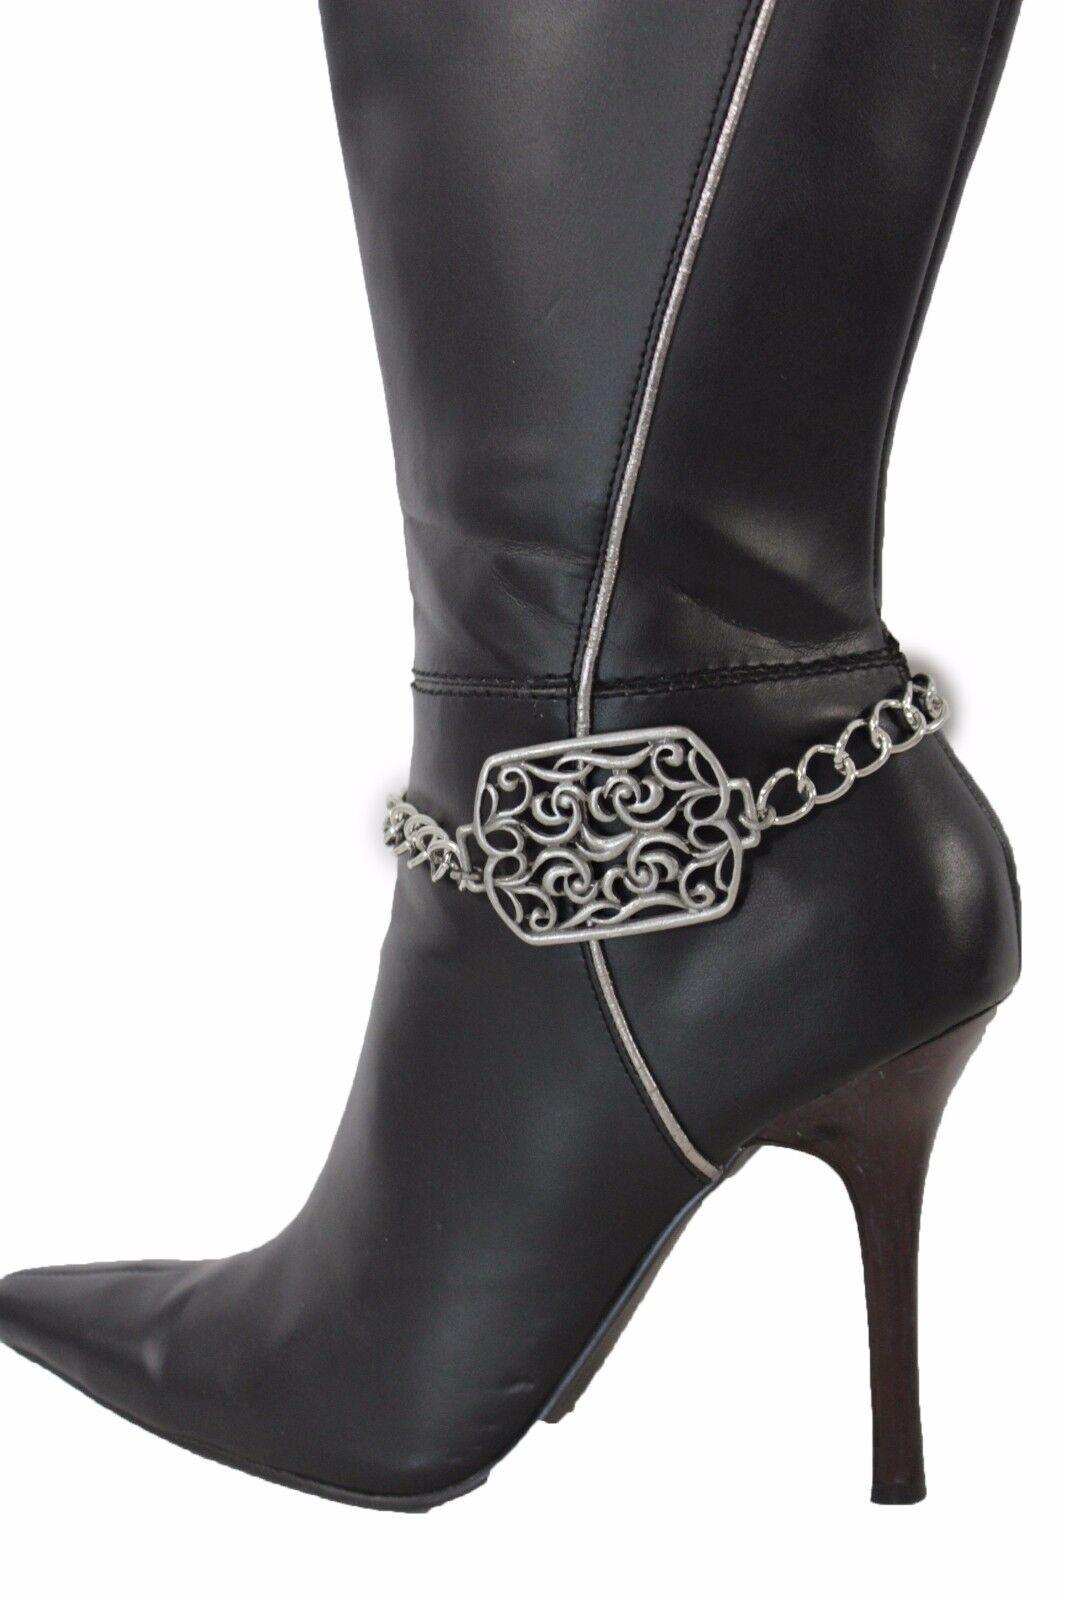 Women Boot Bracelet Silver Metal Chain Anklet Fashion Shoe Square Floral Charm